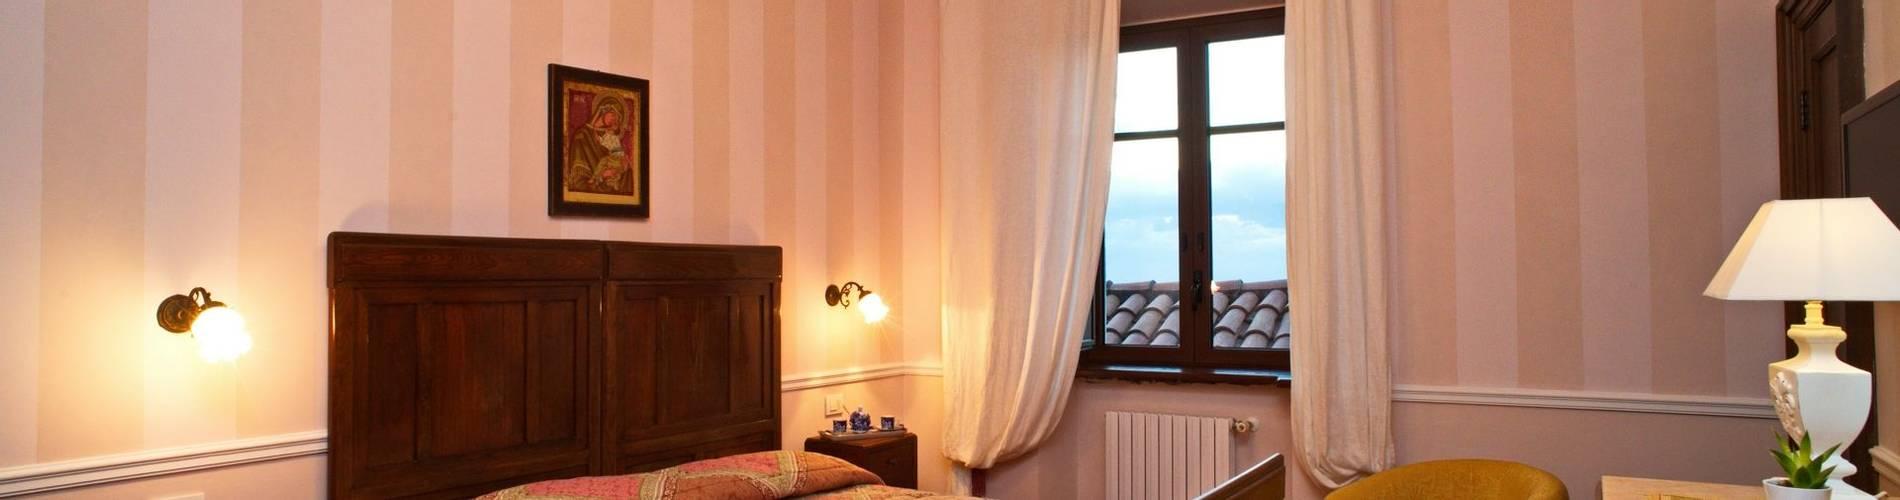 Il Casale, Calabria, Italy, Room.jpg